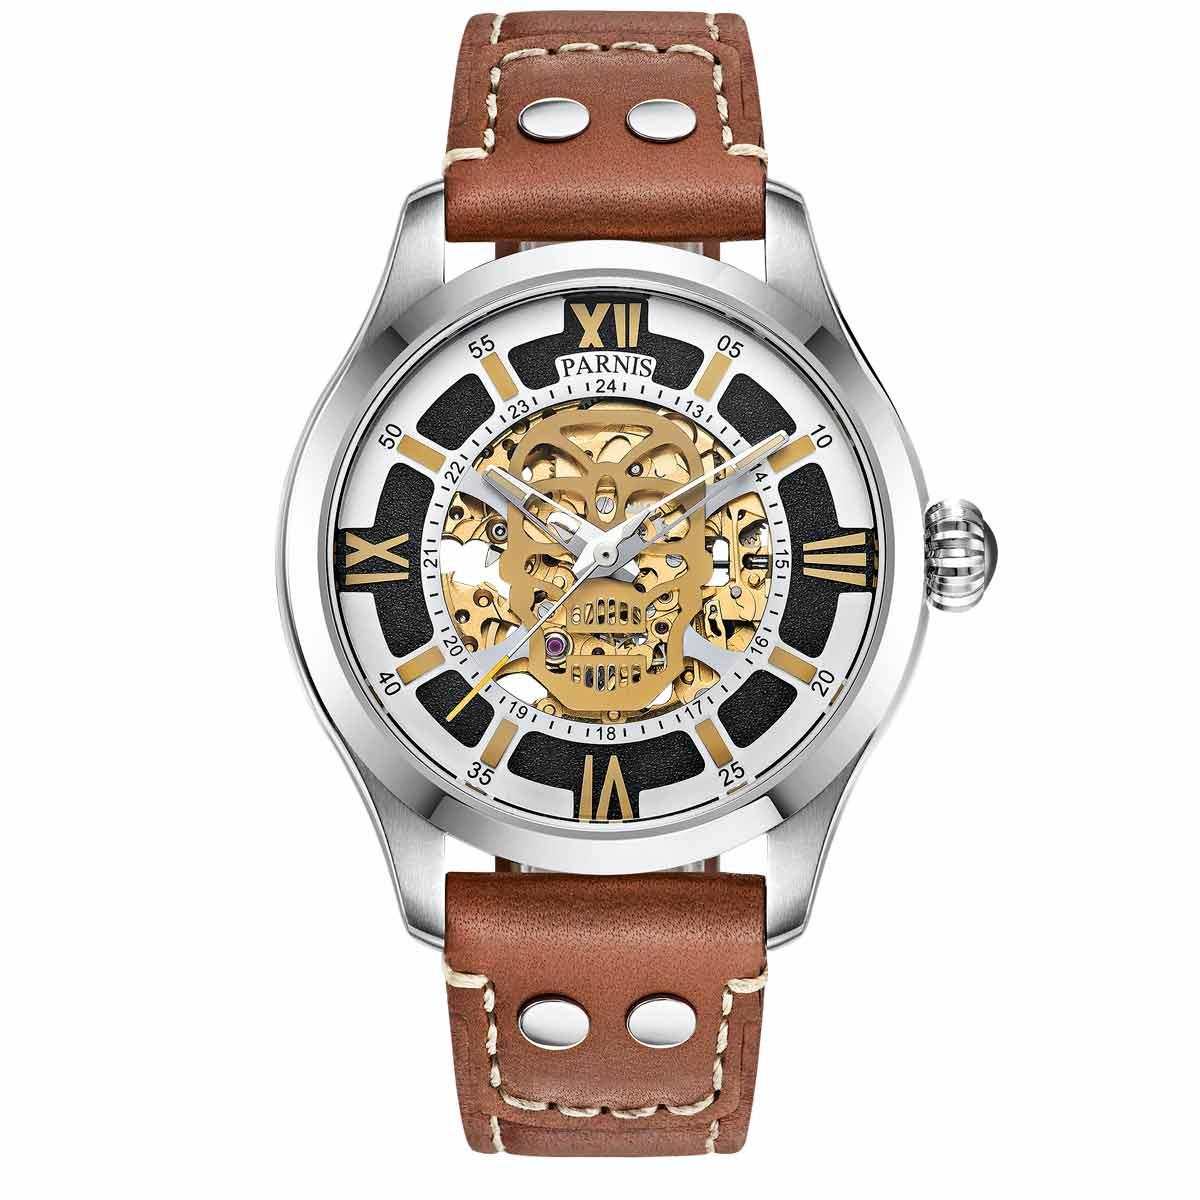 PARNIS标准打数青漆自动卷手表[PA6054-S3AL-SVBR]并进进口商品纯正情况厂商保证12个月